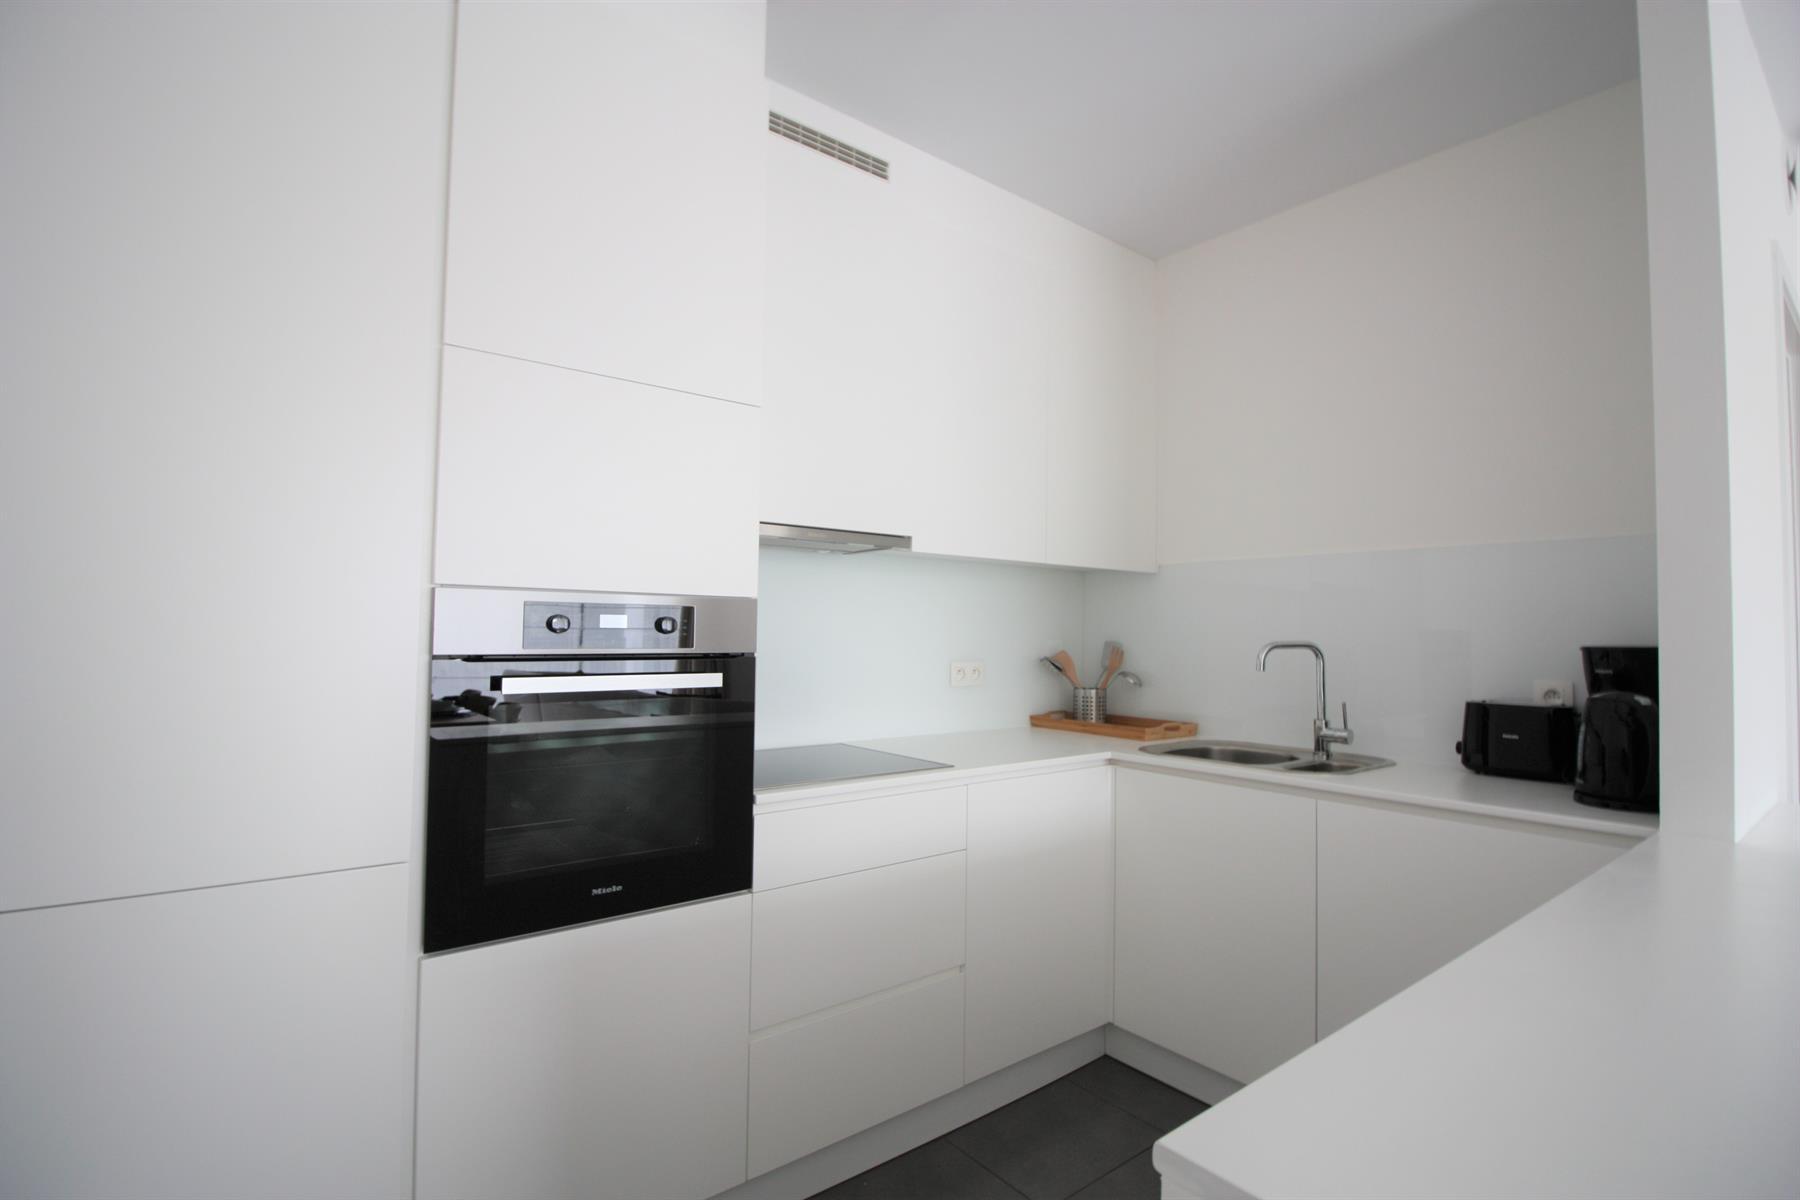 Appartement - Woluwe-Saint-Lambert - #4395355-5